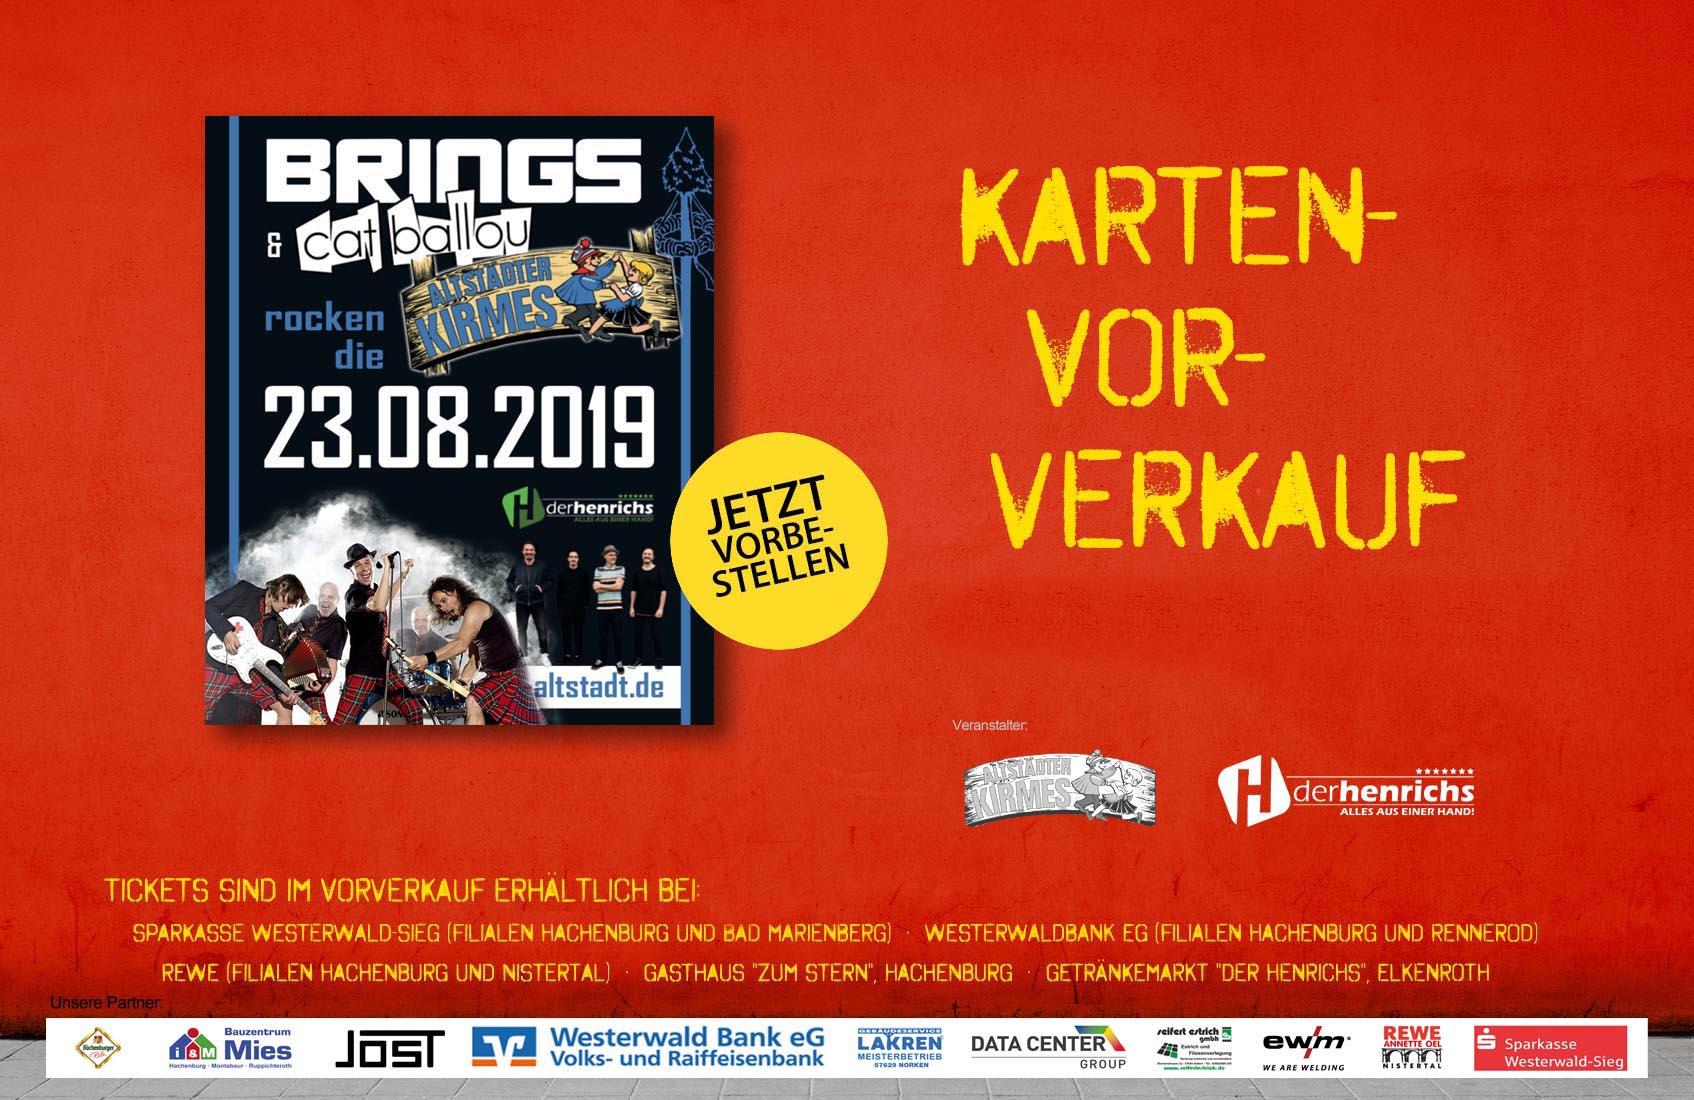 popup-karten-vvk-brings-kg-altstadt-2019-vvk-stellen-1-partner-lang